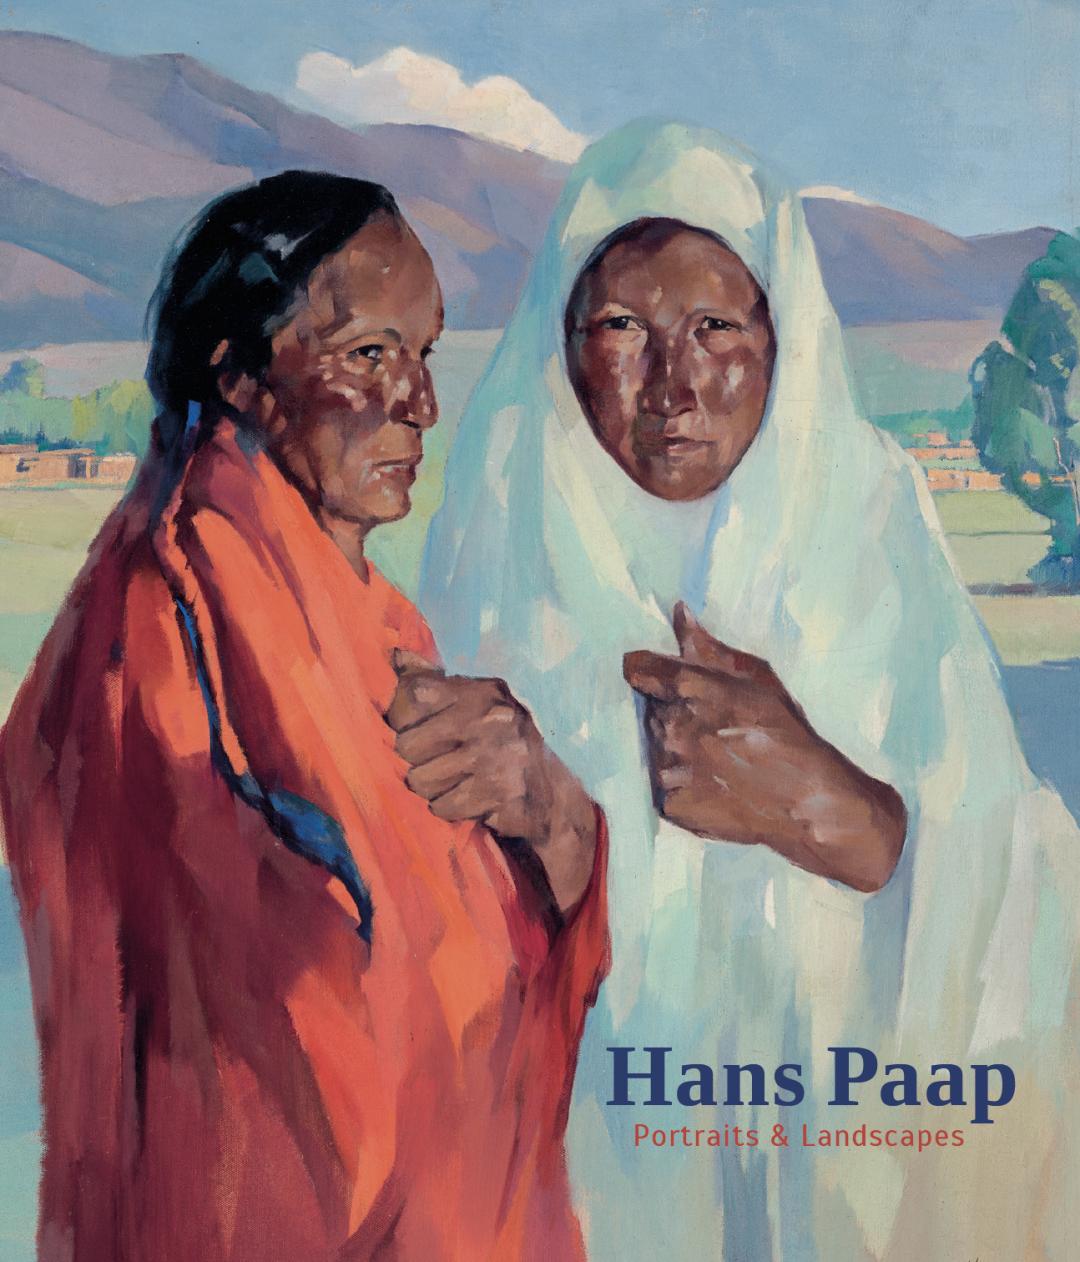 https://www.amazon.com/Hans-Paap-Portraits-Landscapes-nancy/dp/0692169563/ref=sr_1_3?keywords=Hans+Paap&qid=1553283604&s=gateway&sr=8-3-spell